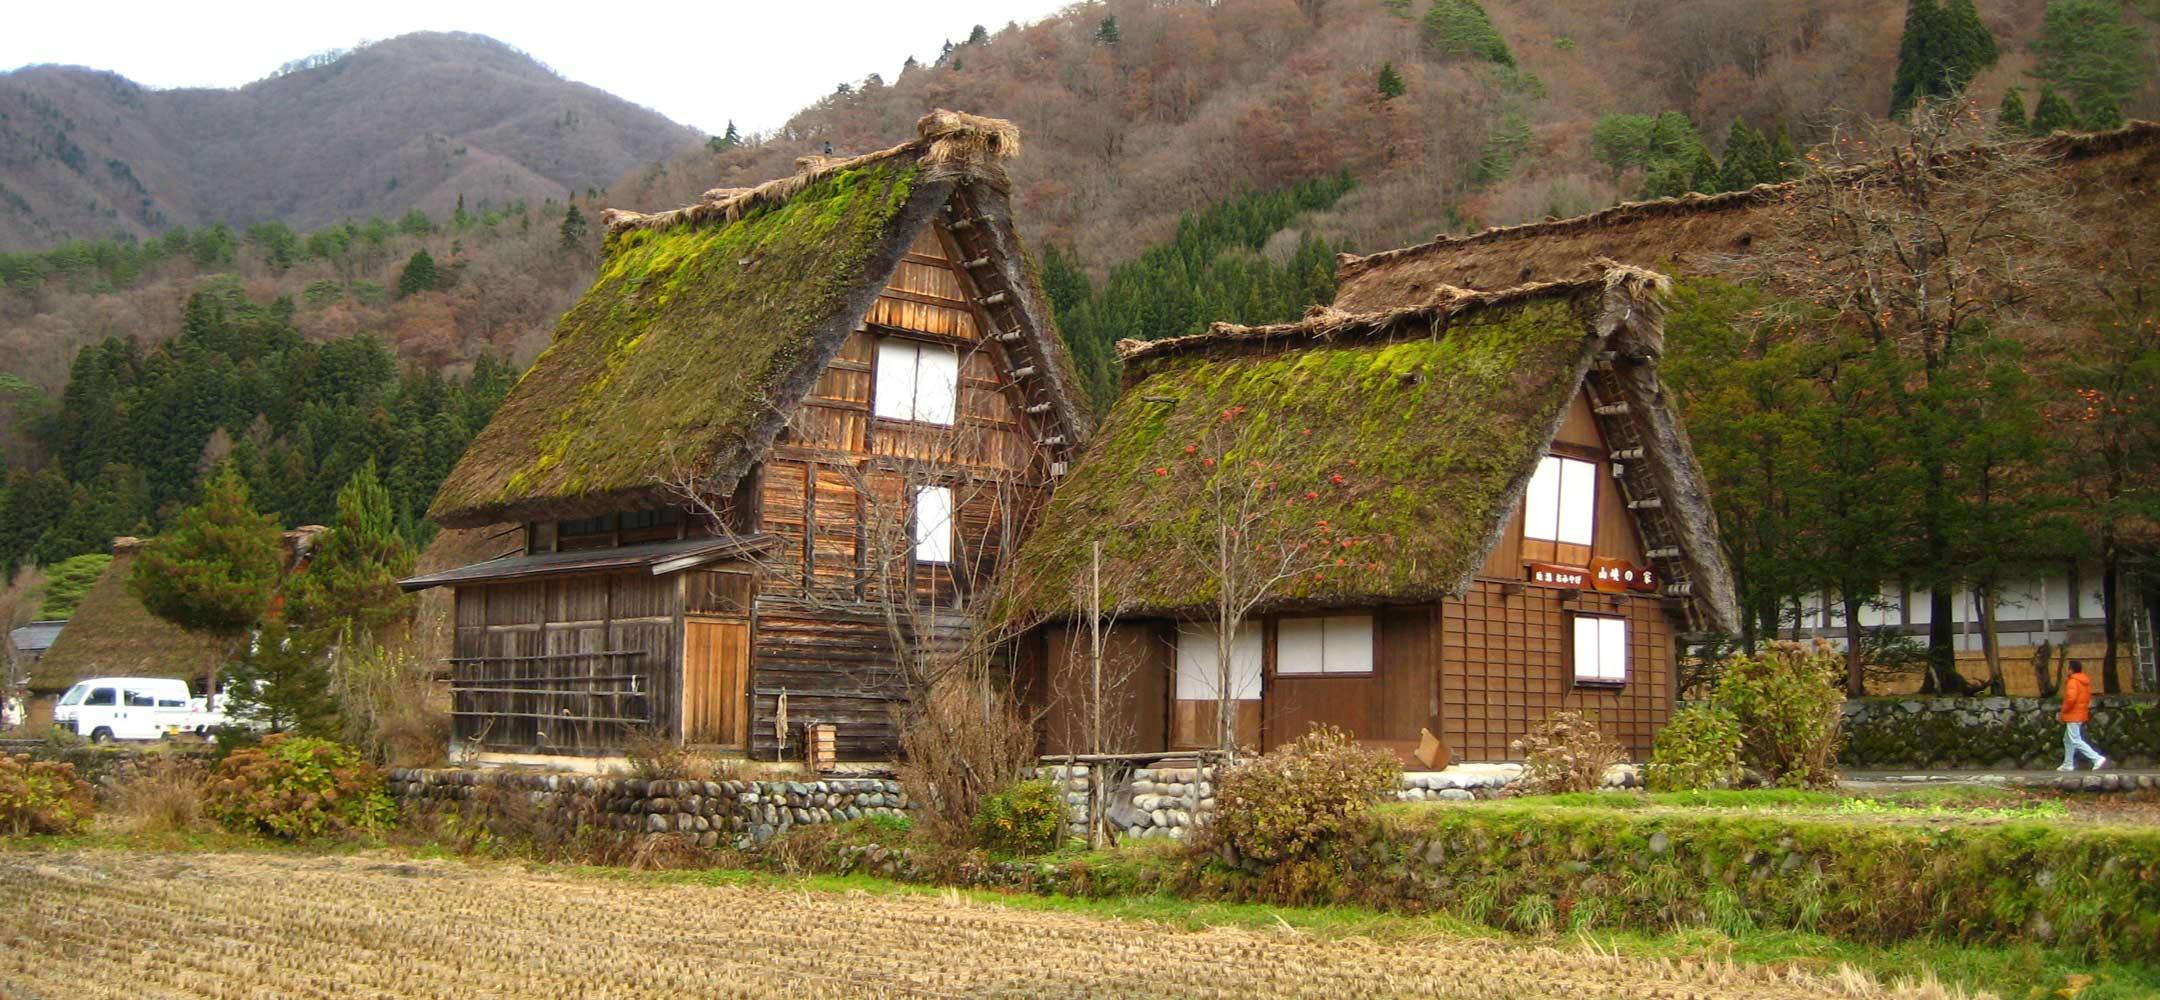 Gassho Zukuri Farmhouse Stay Experience Japan Inside Japan Tours